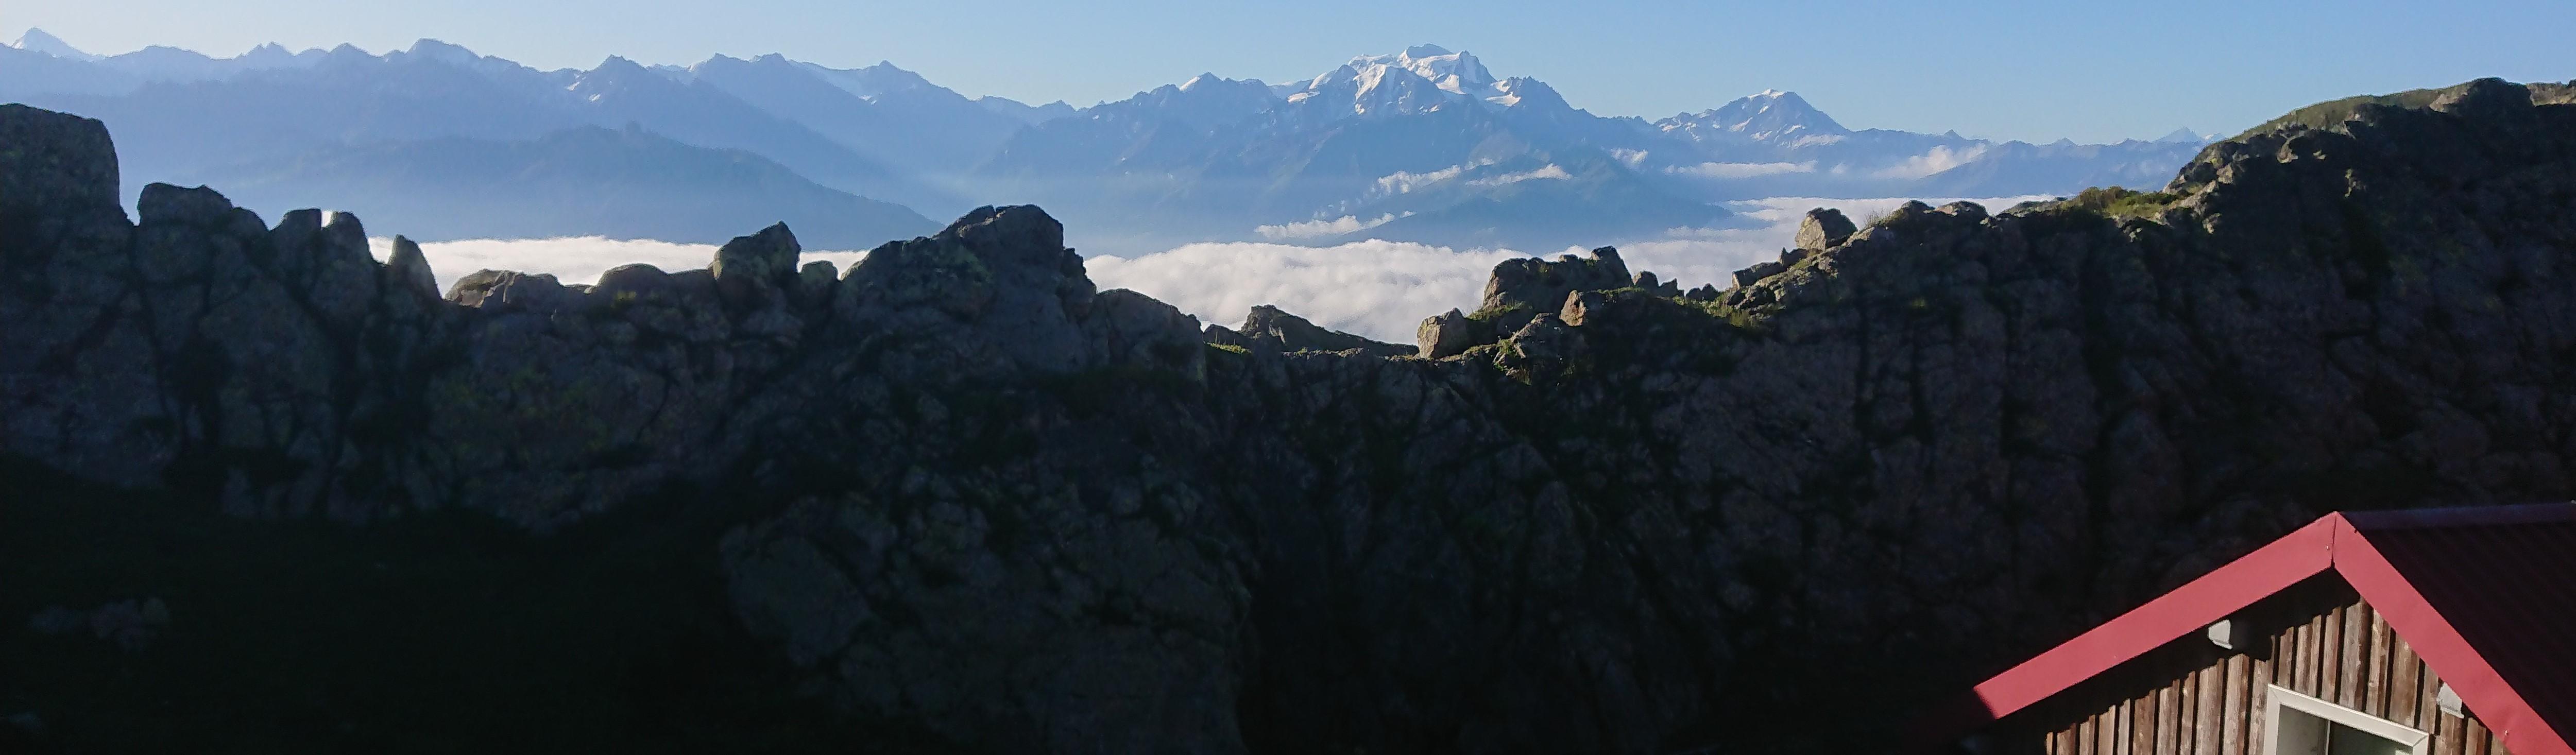 Bergwandelen met Frederike Bloemers